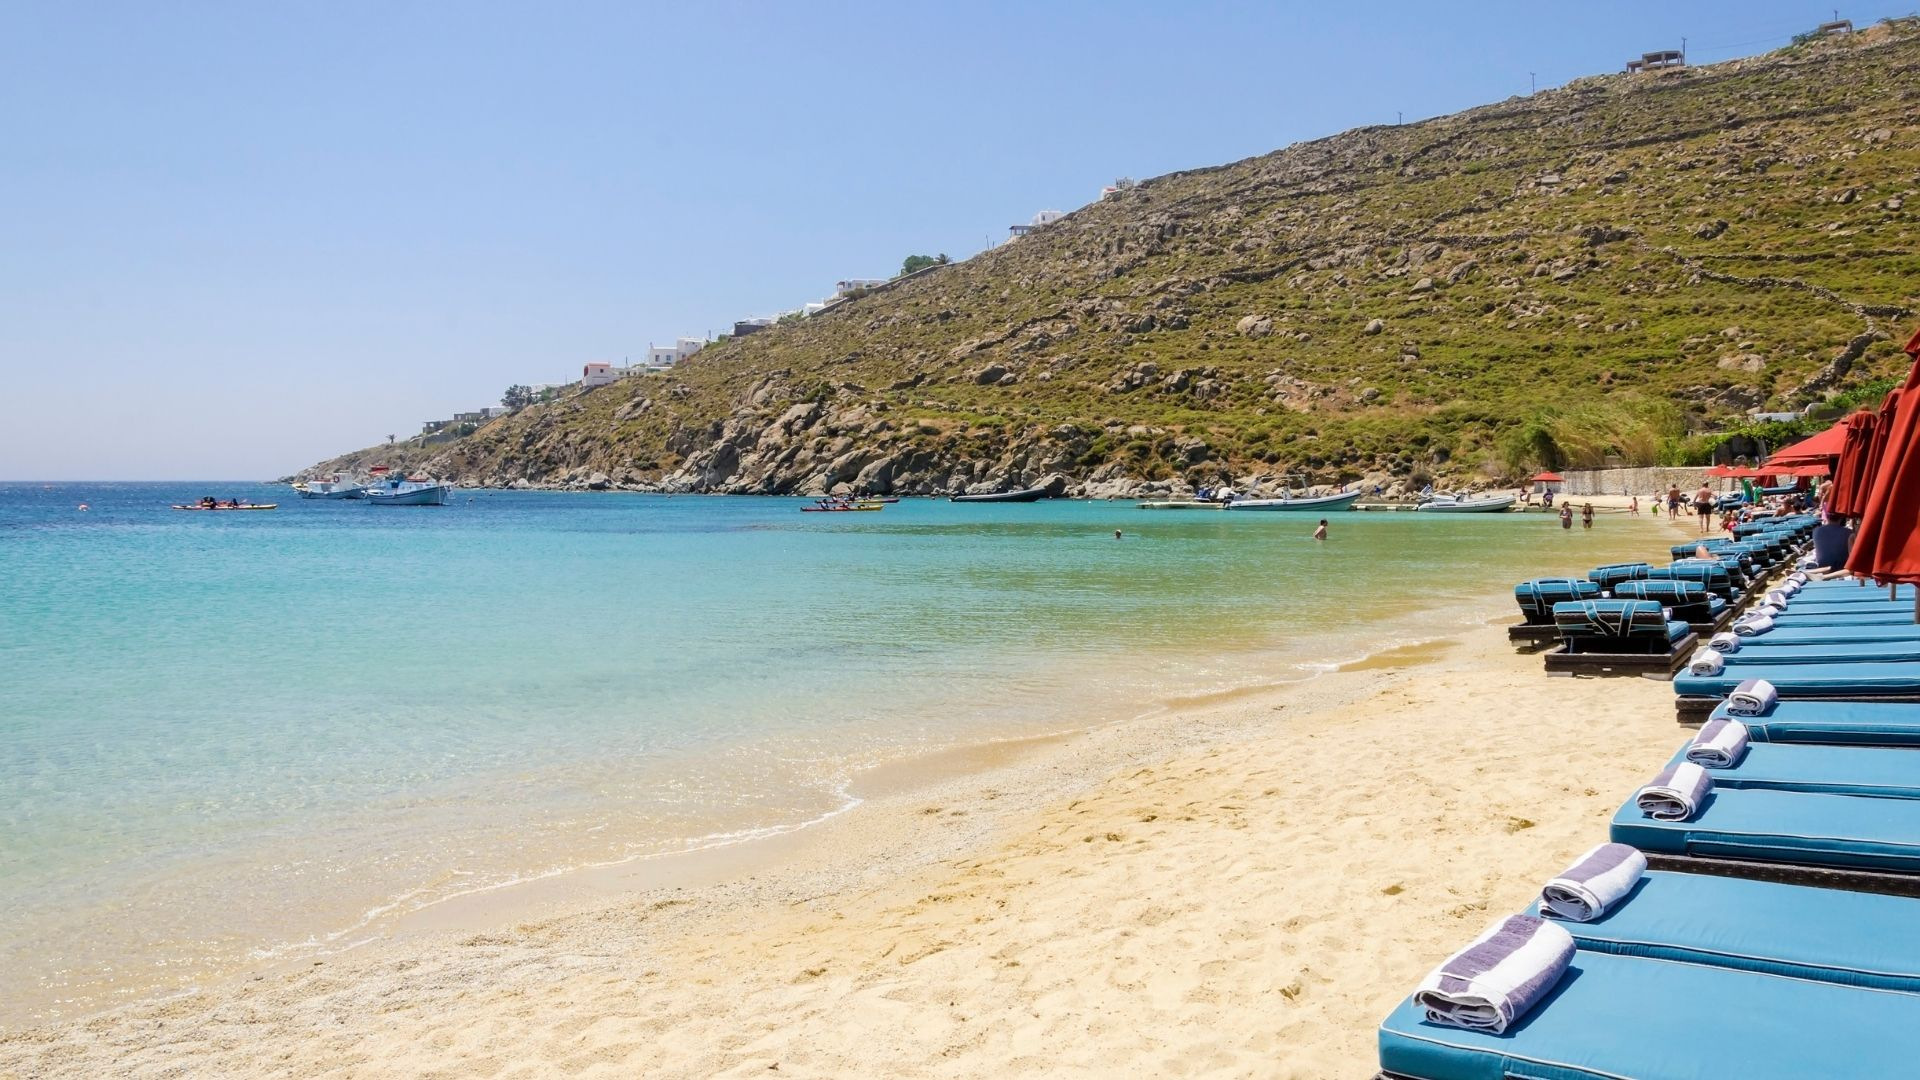 The popular ,among celebrities beach, Psarou